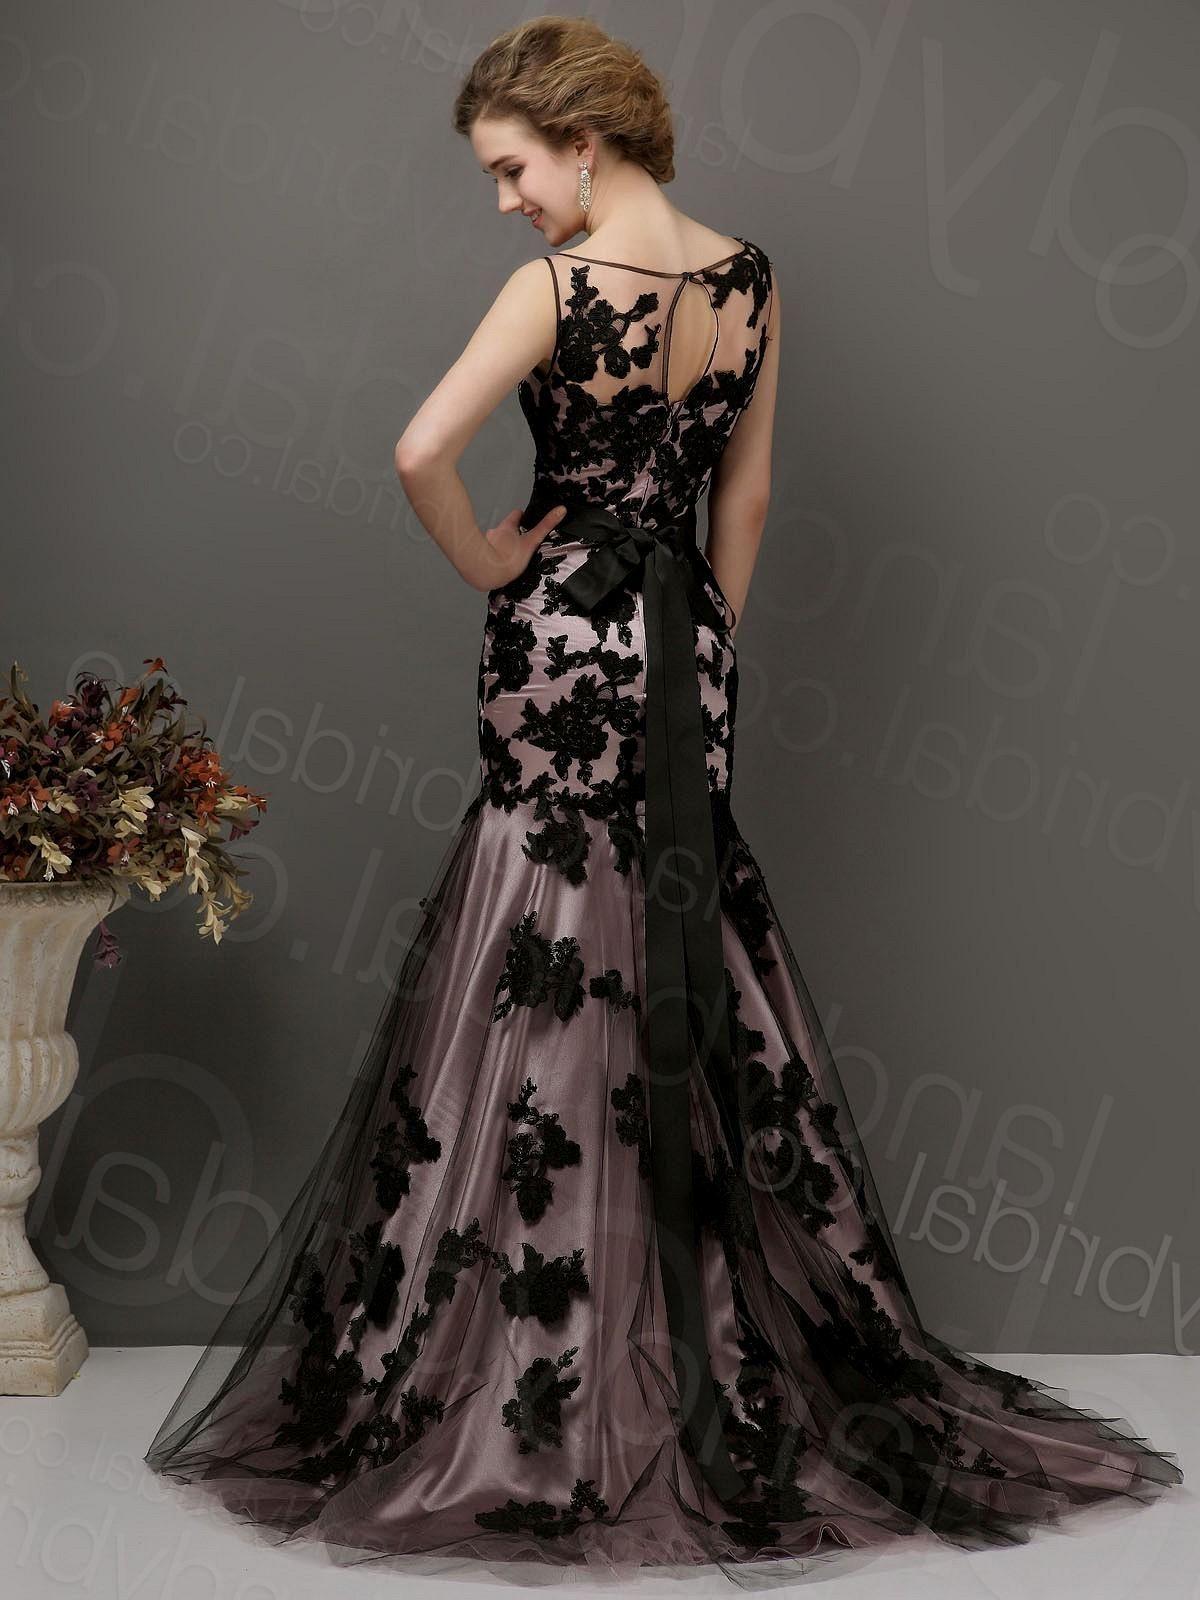 50+ Wedding Dress Black - Dressy Dresses for Weddings Check more at ...